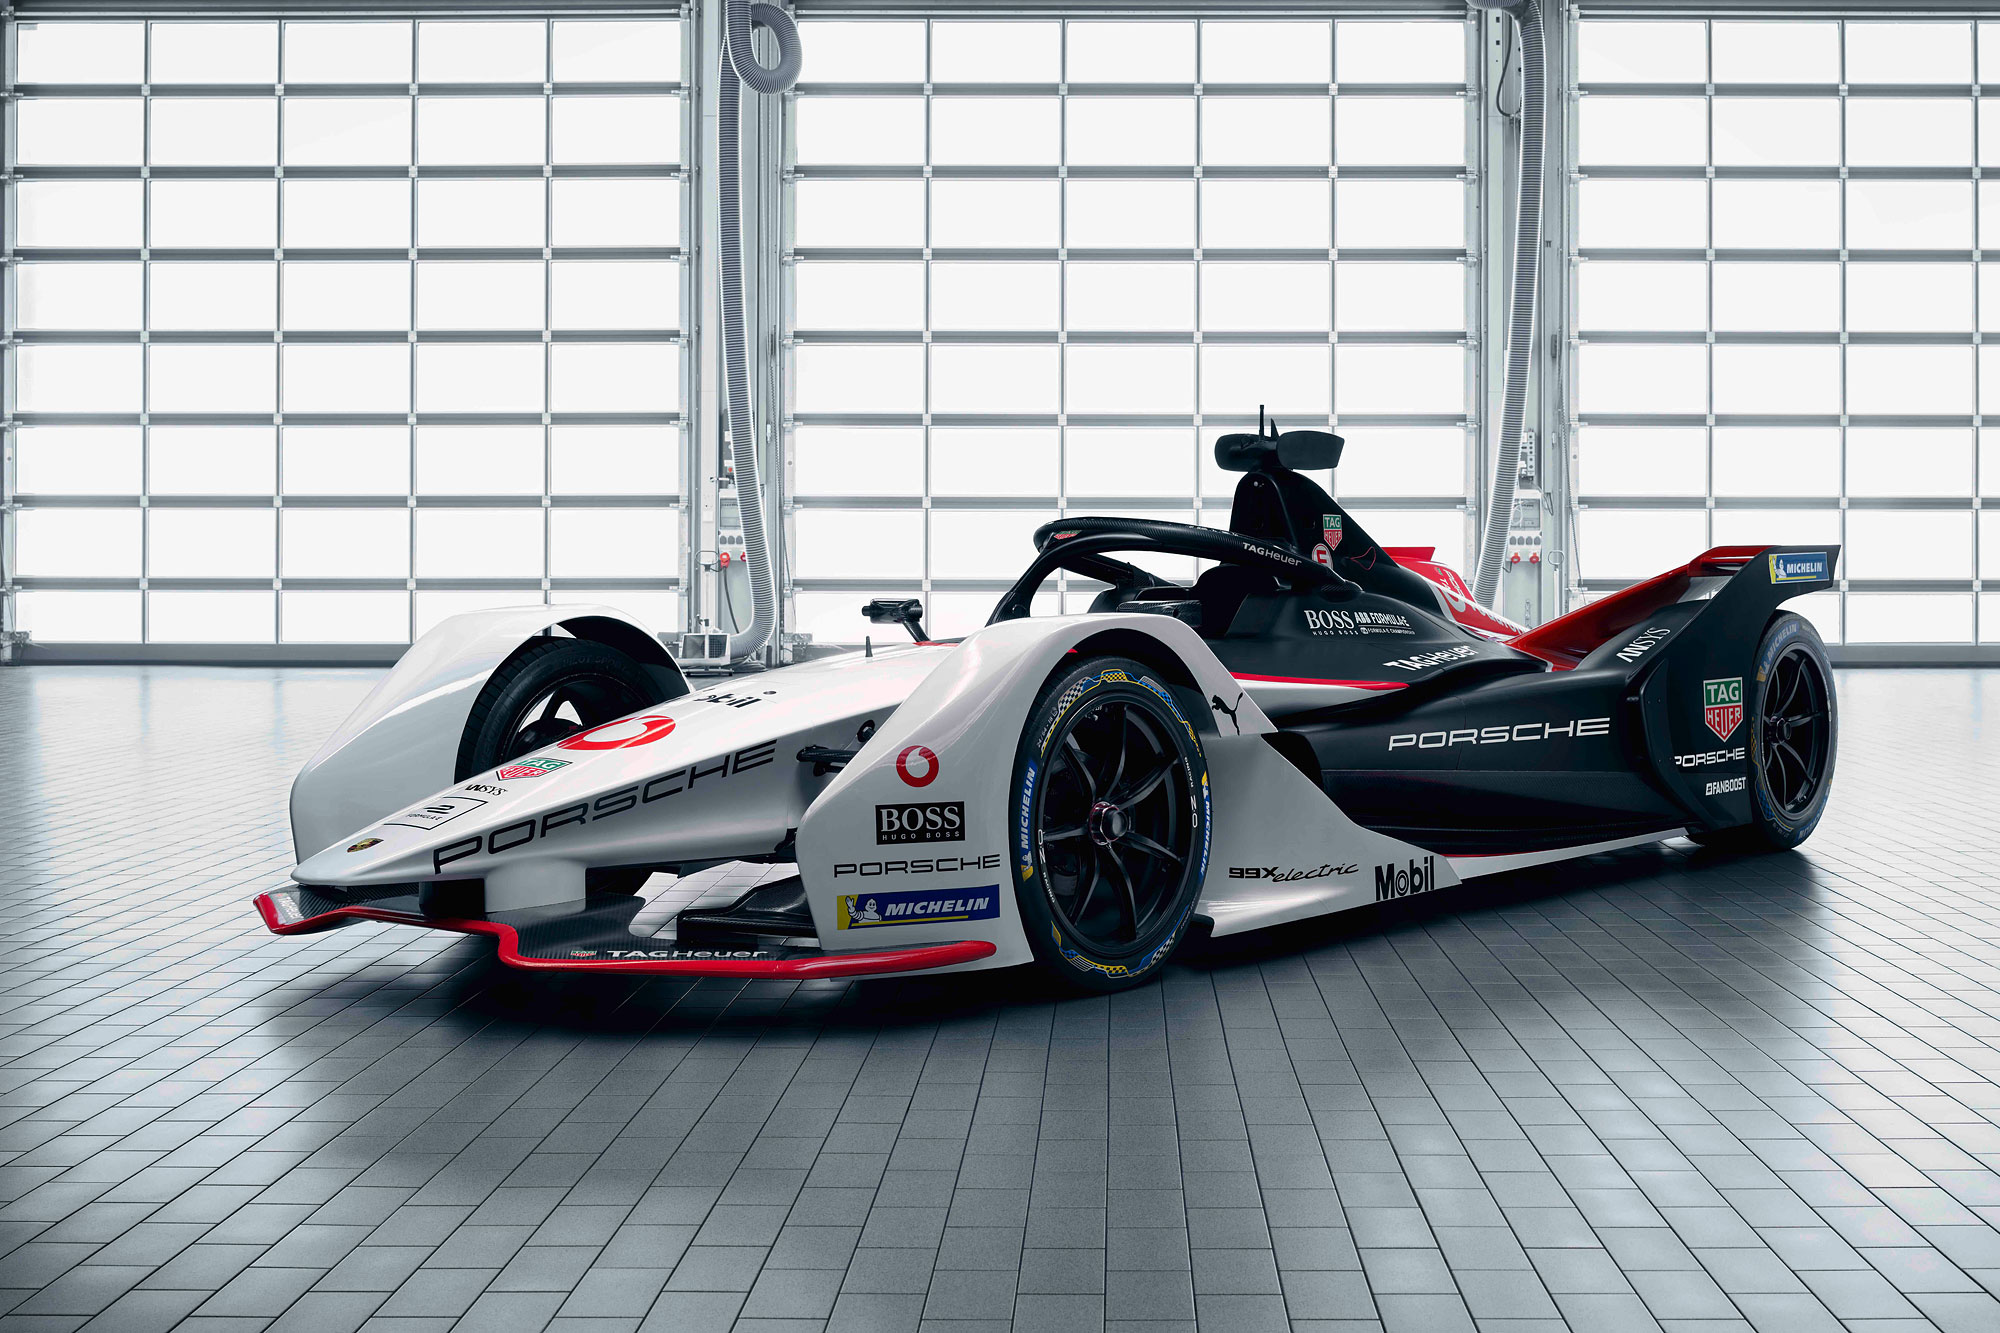 99X Electric 是 Porsche 進軍 Formula E 電動方程式錦標賽的首發作品。